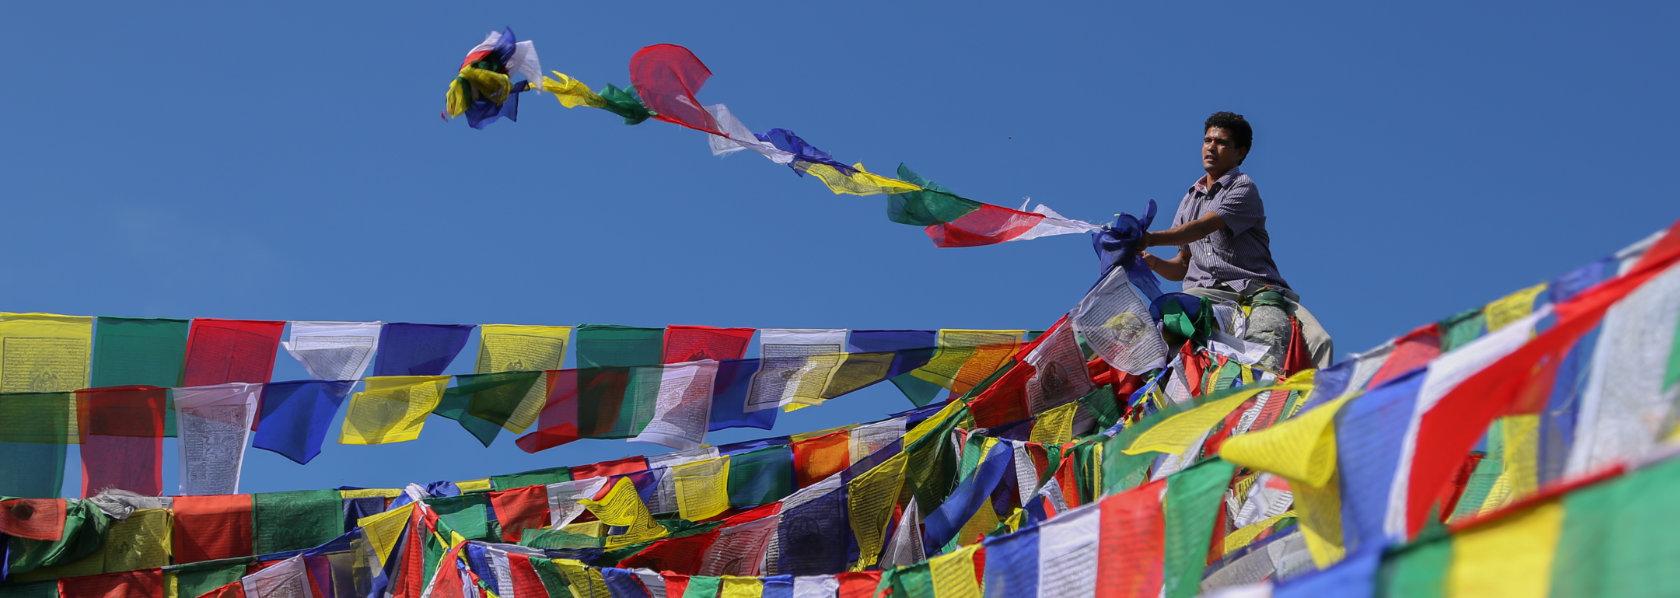 A man sitting high up throwing a string of buddhist flags - Precious Guru - THIS Buddhist Film Festival